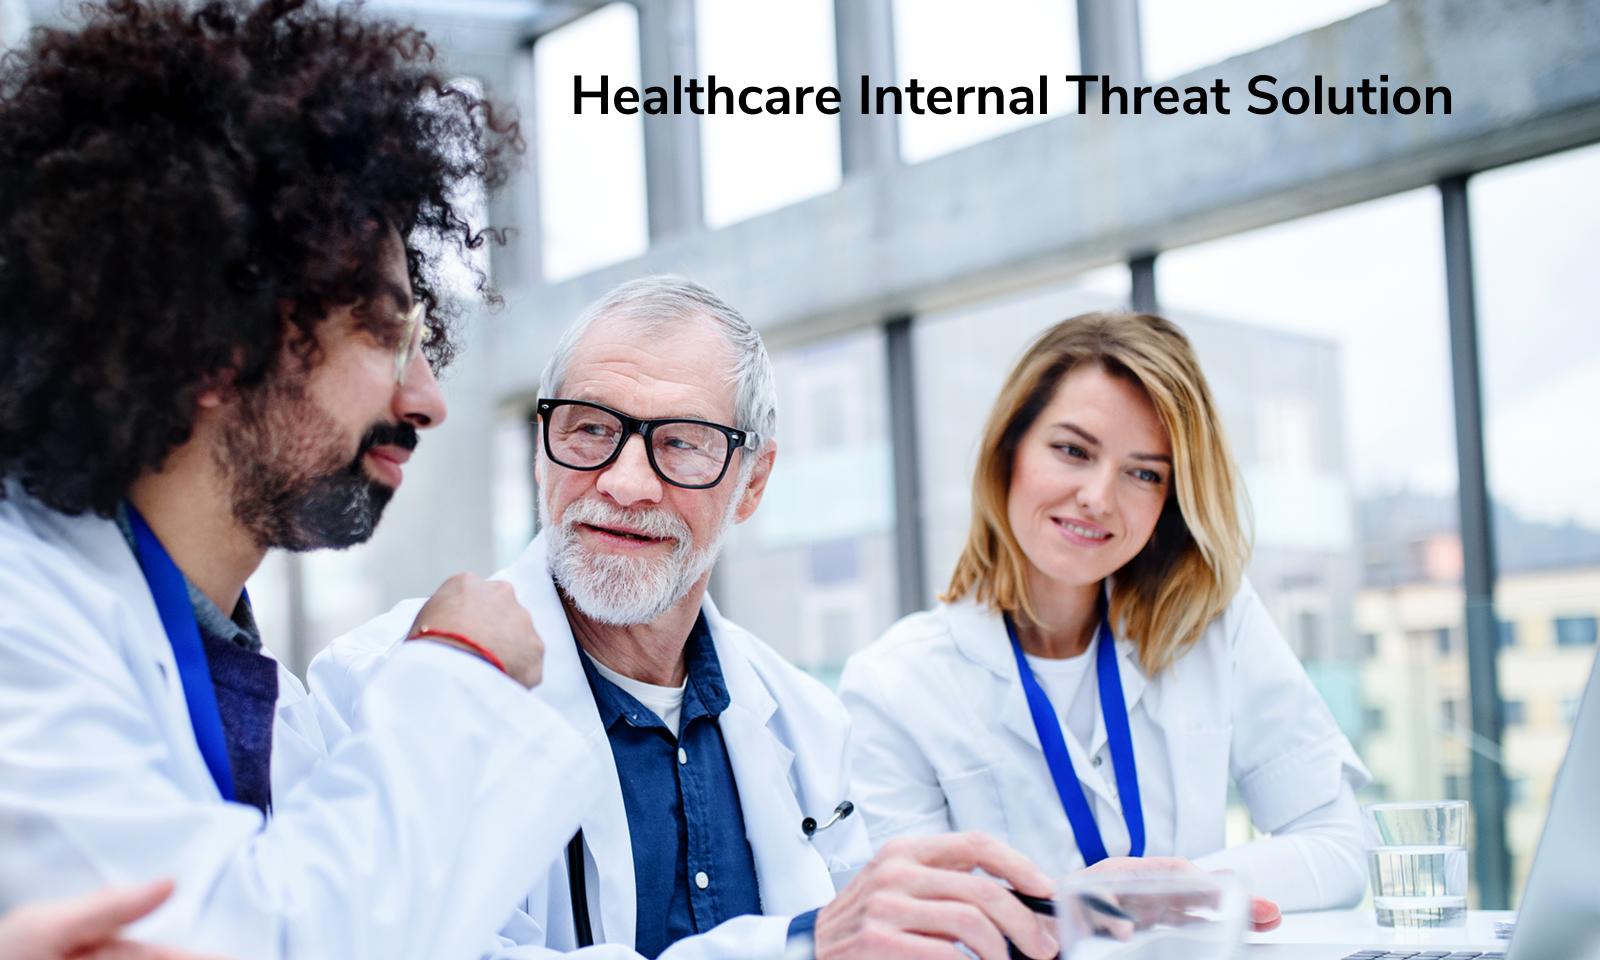 Healthcare Internal Threat Solution